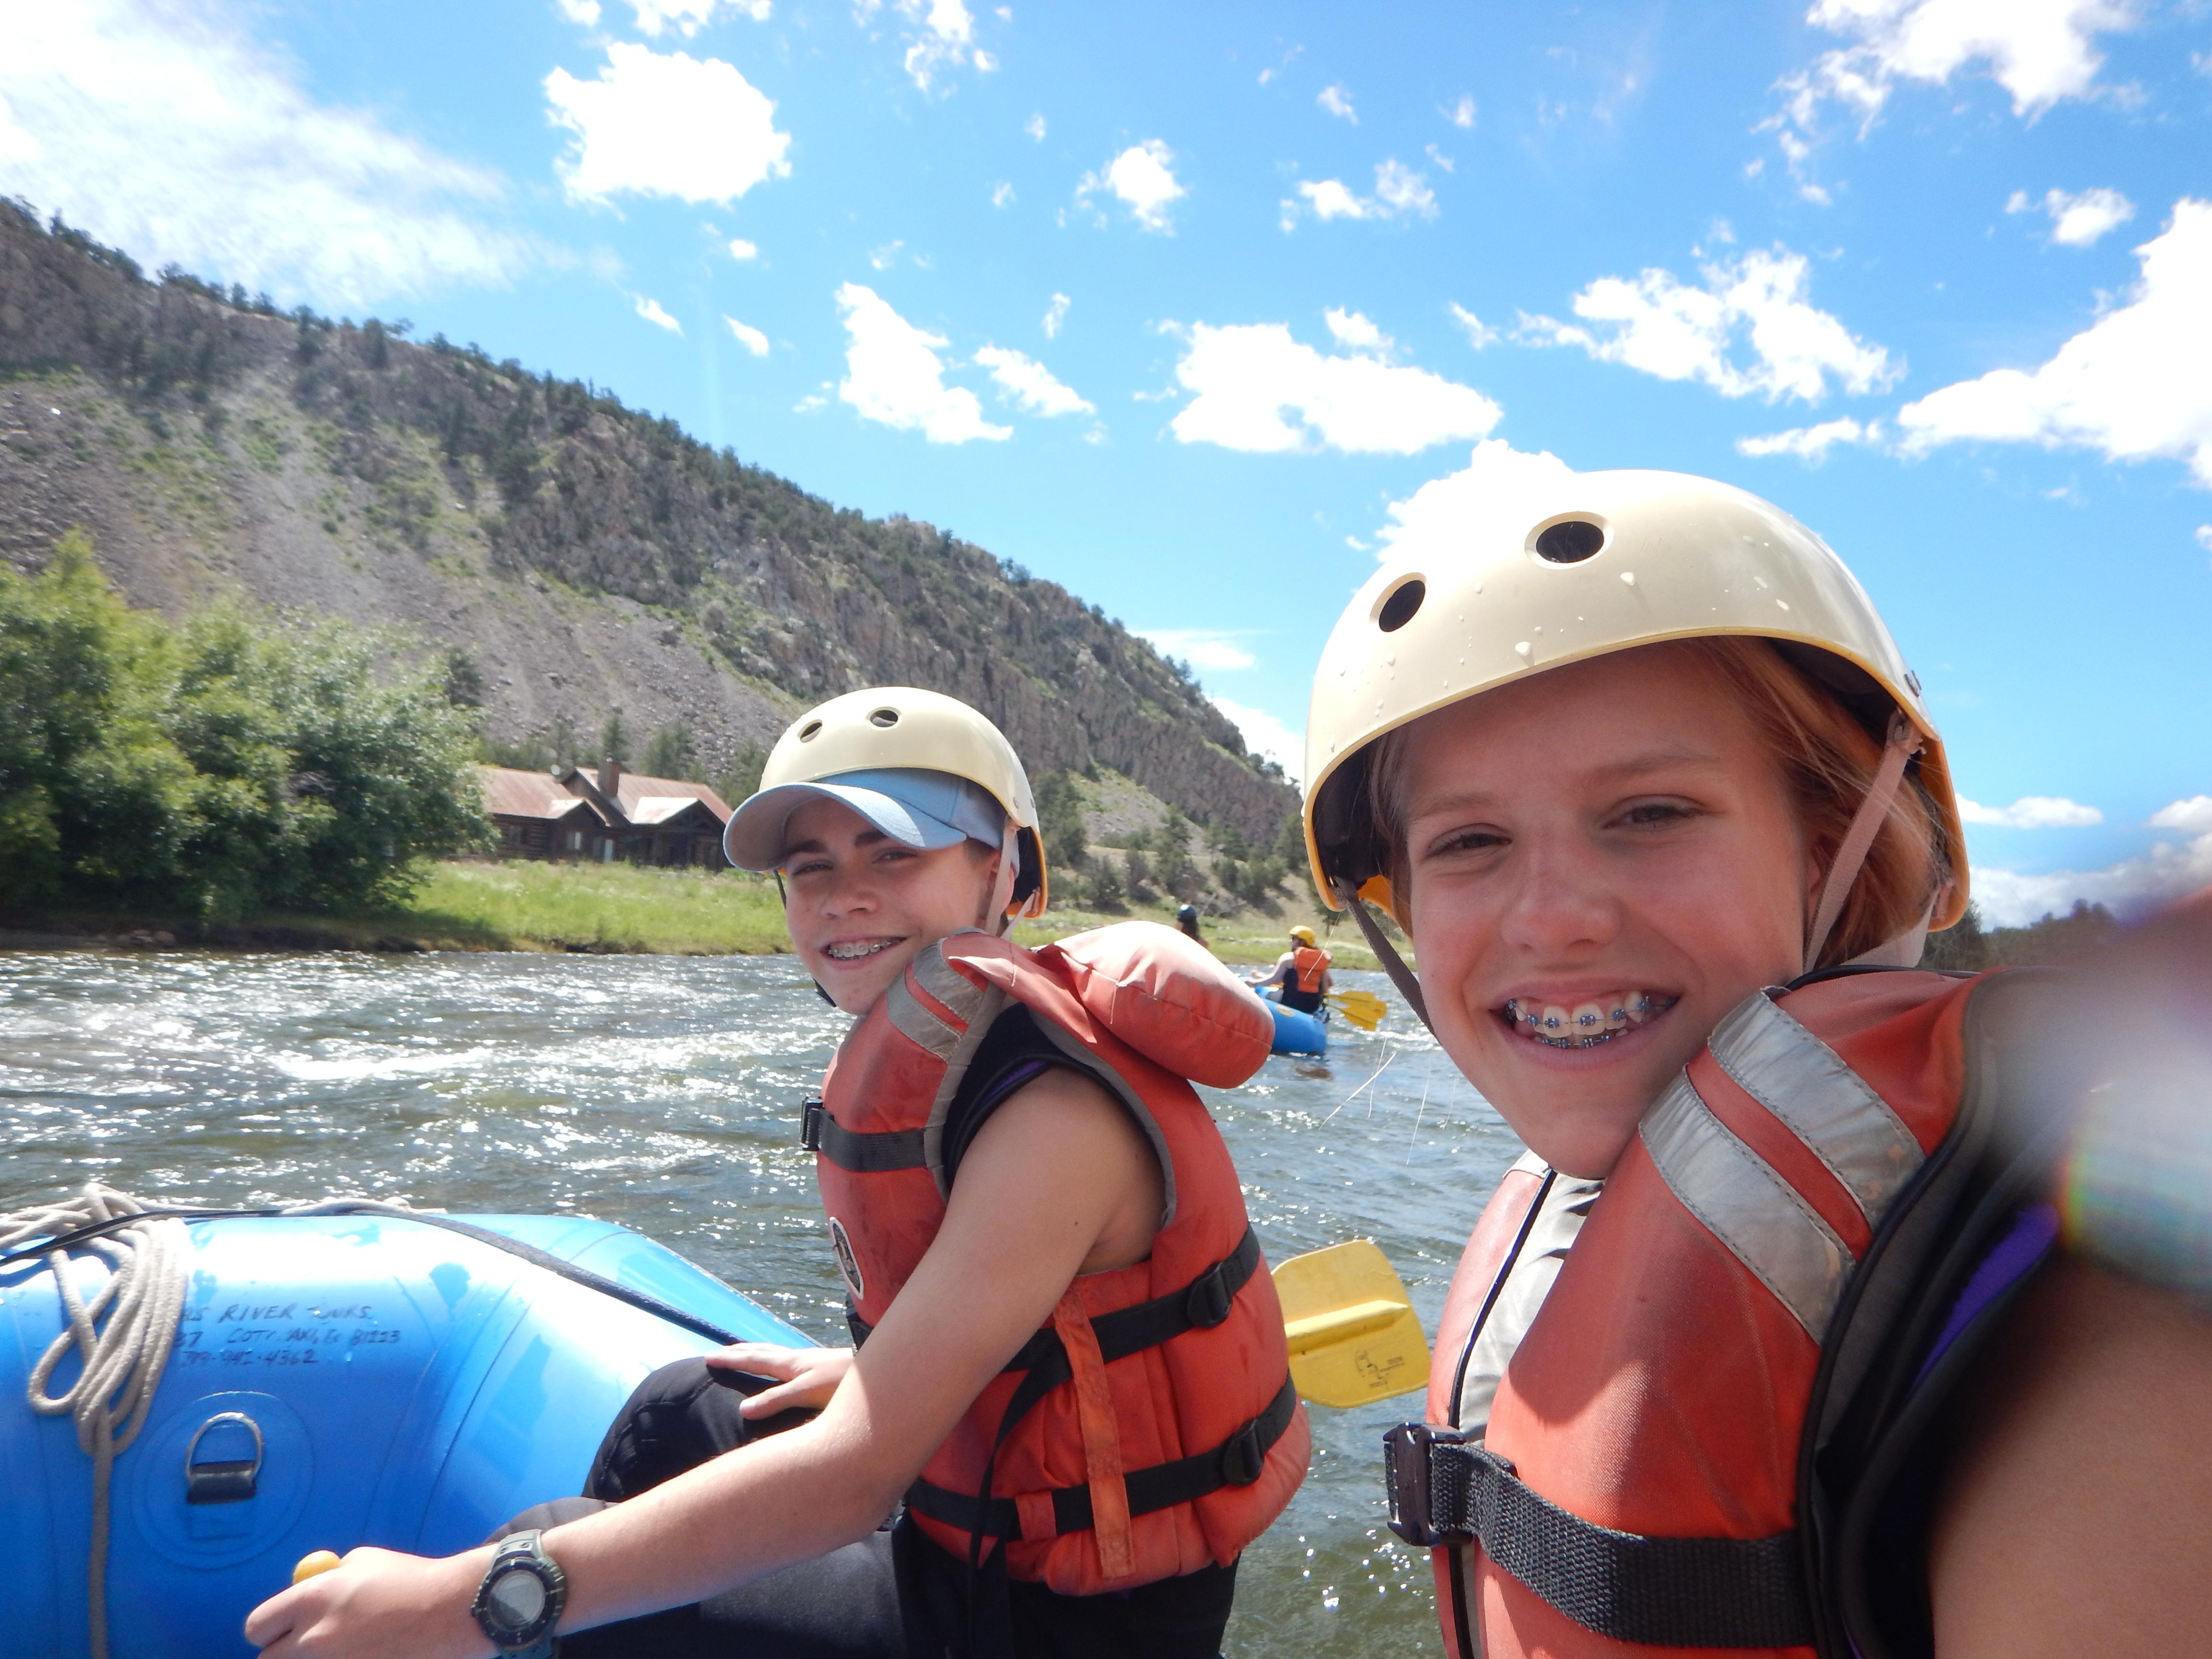 Summer Program - Whitewater Rafting | High Mountain Institute: High Peaks Adventure